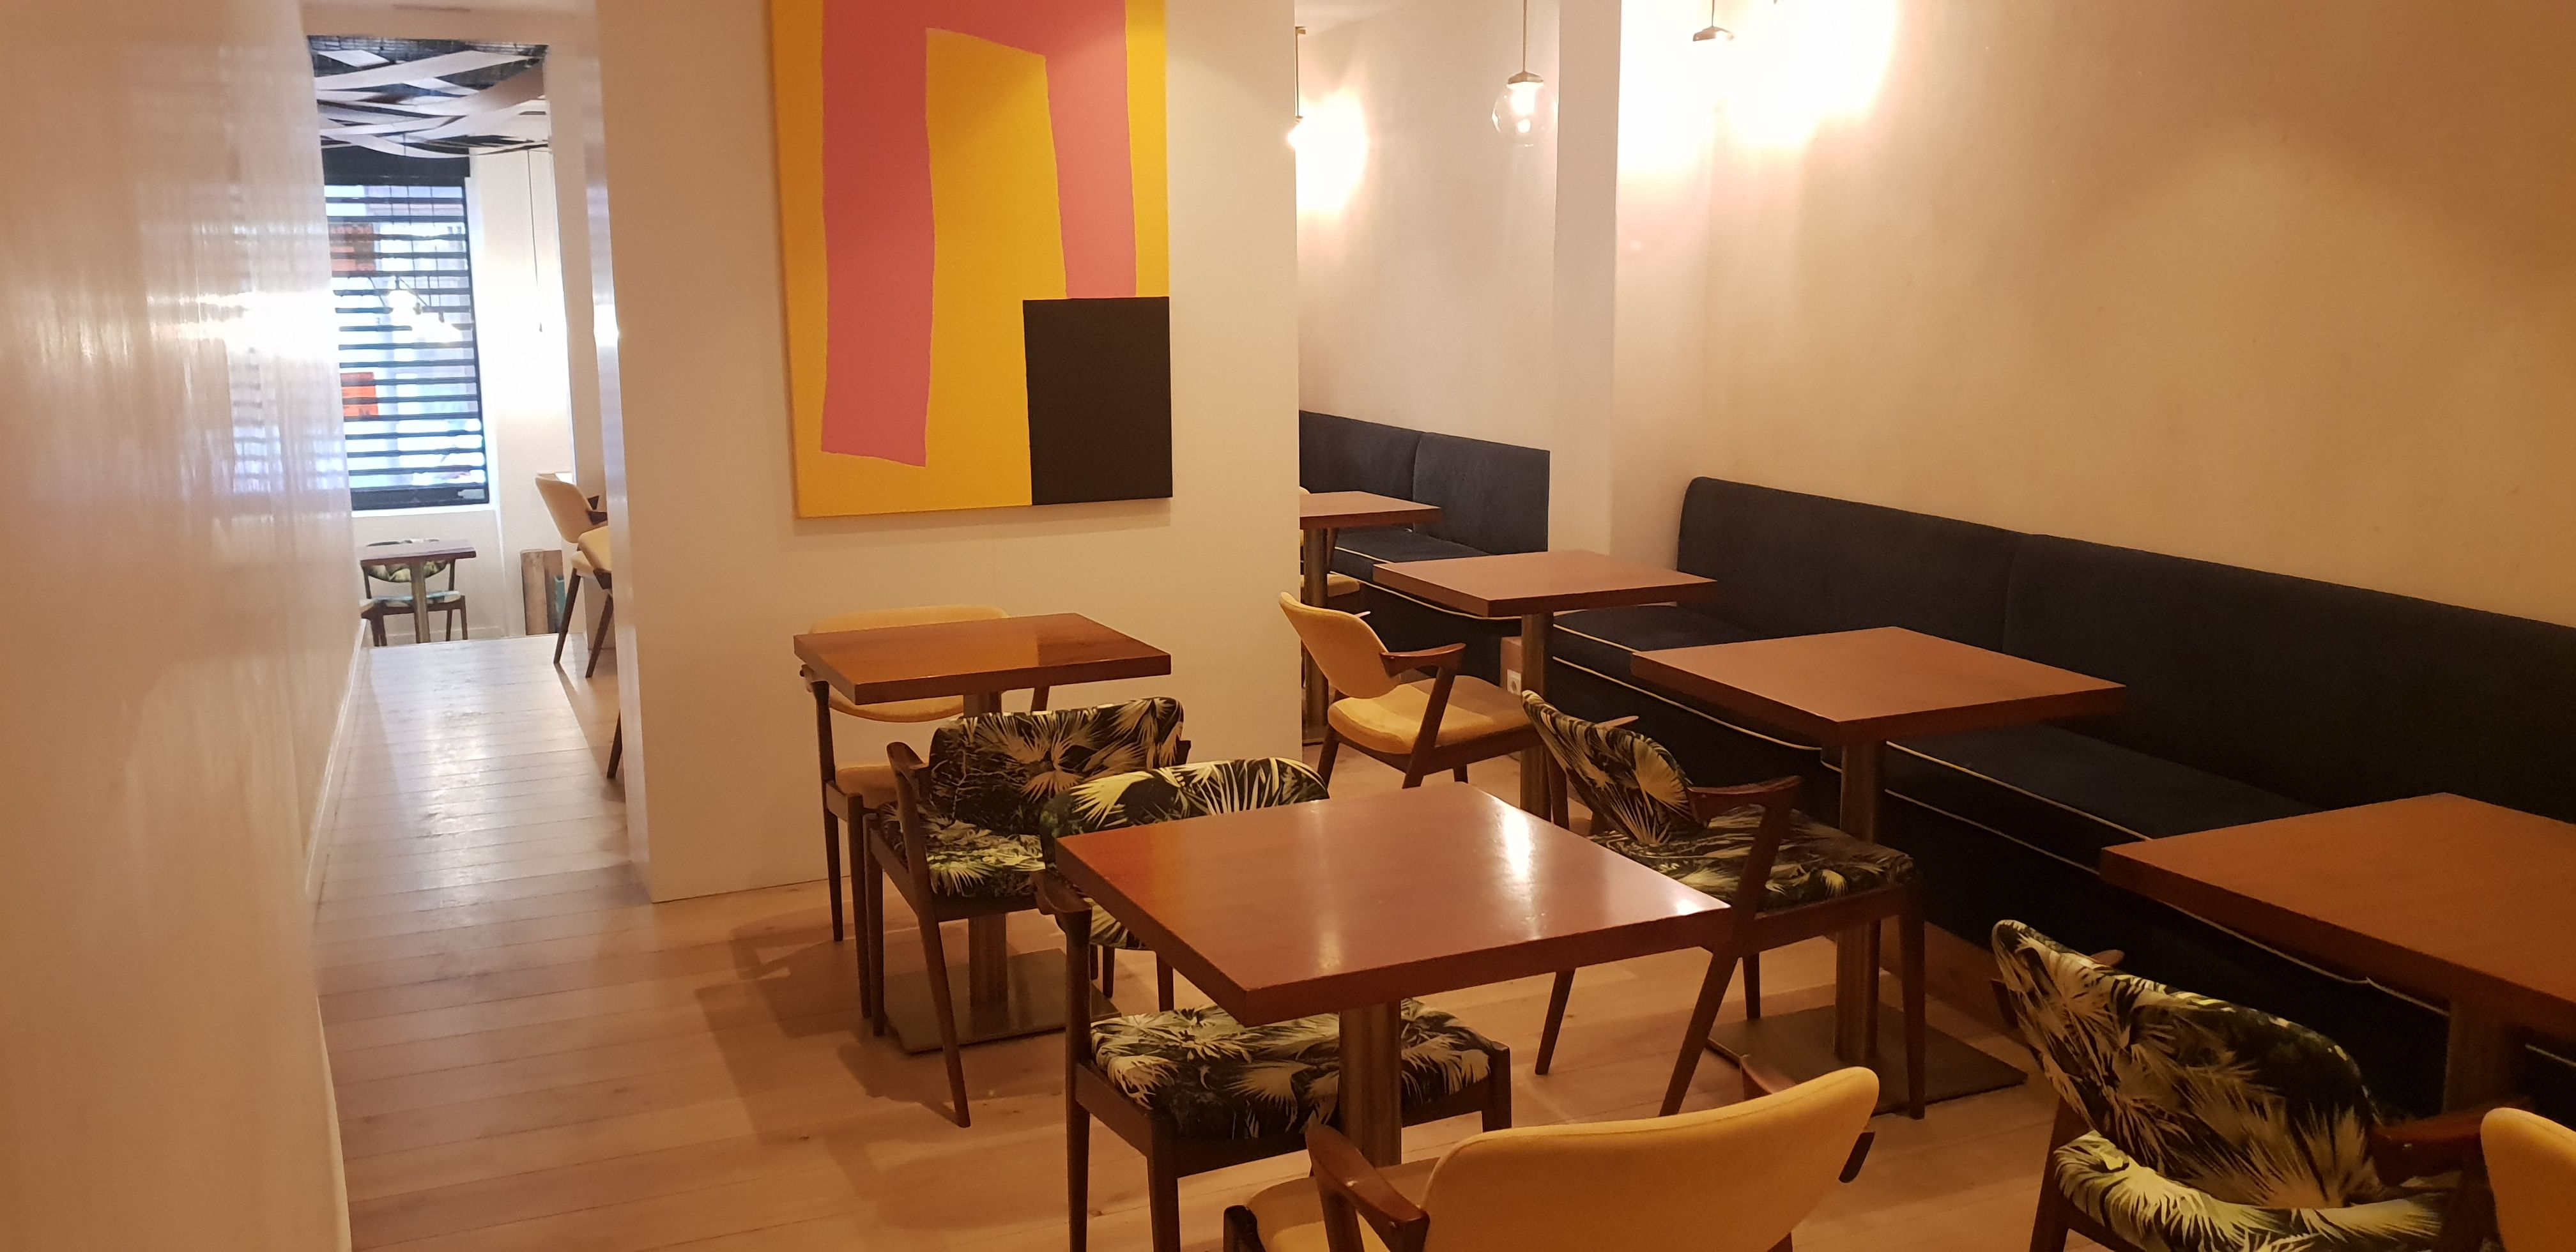 (Español) Malasaña – Se traspasa Restaurante de 130 m2